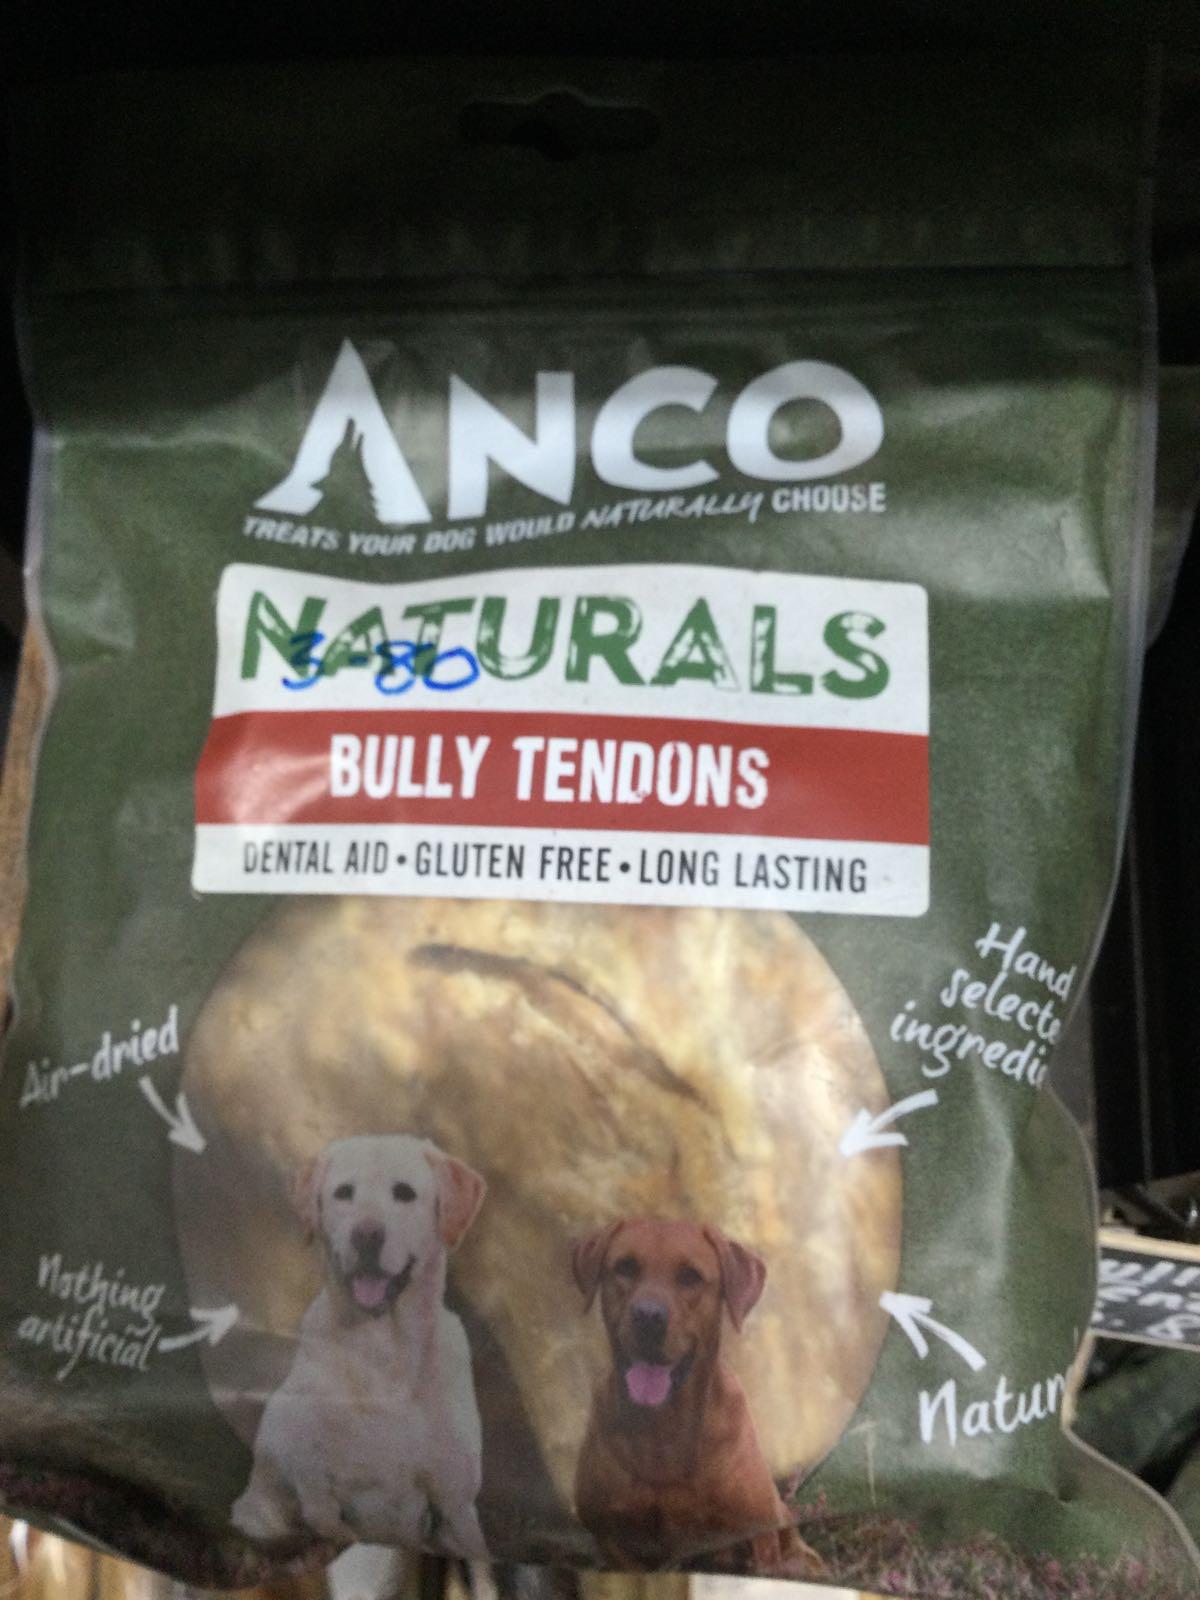 Anco Bully tendons